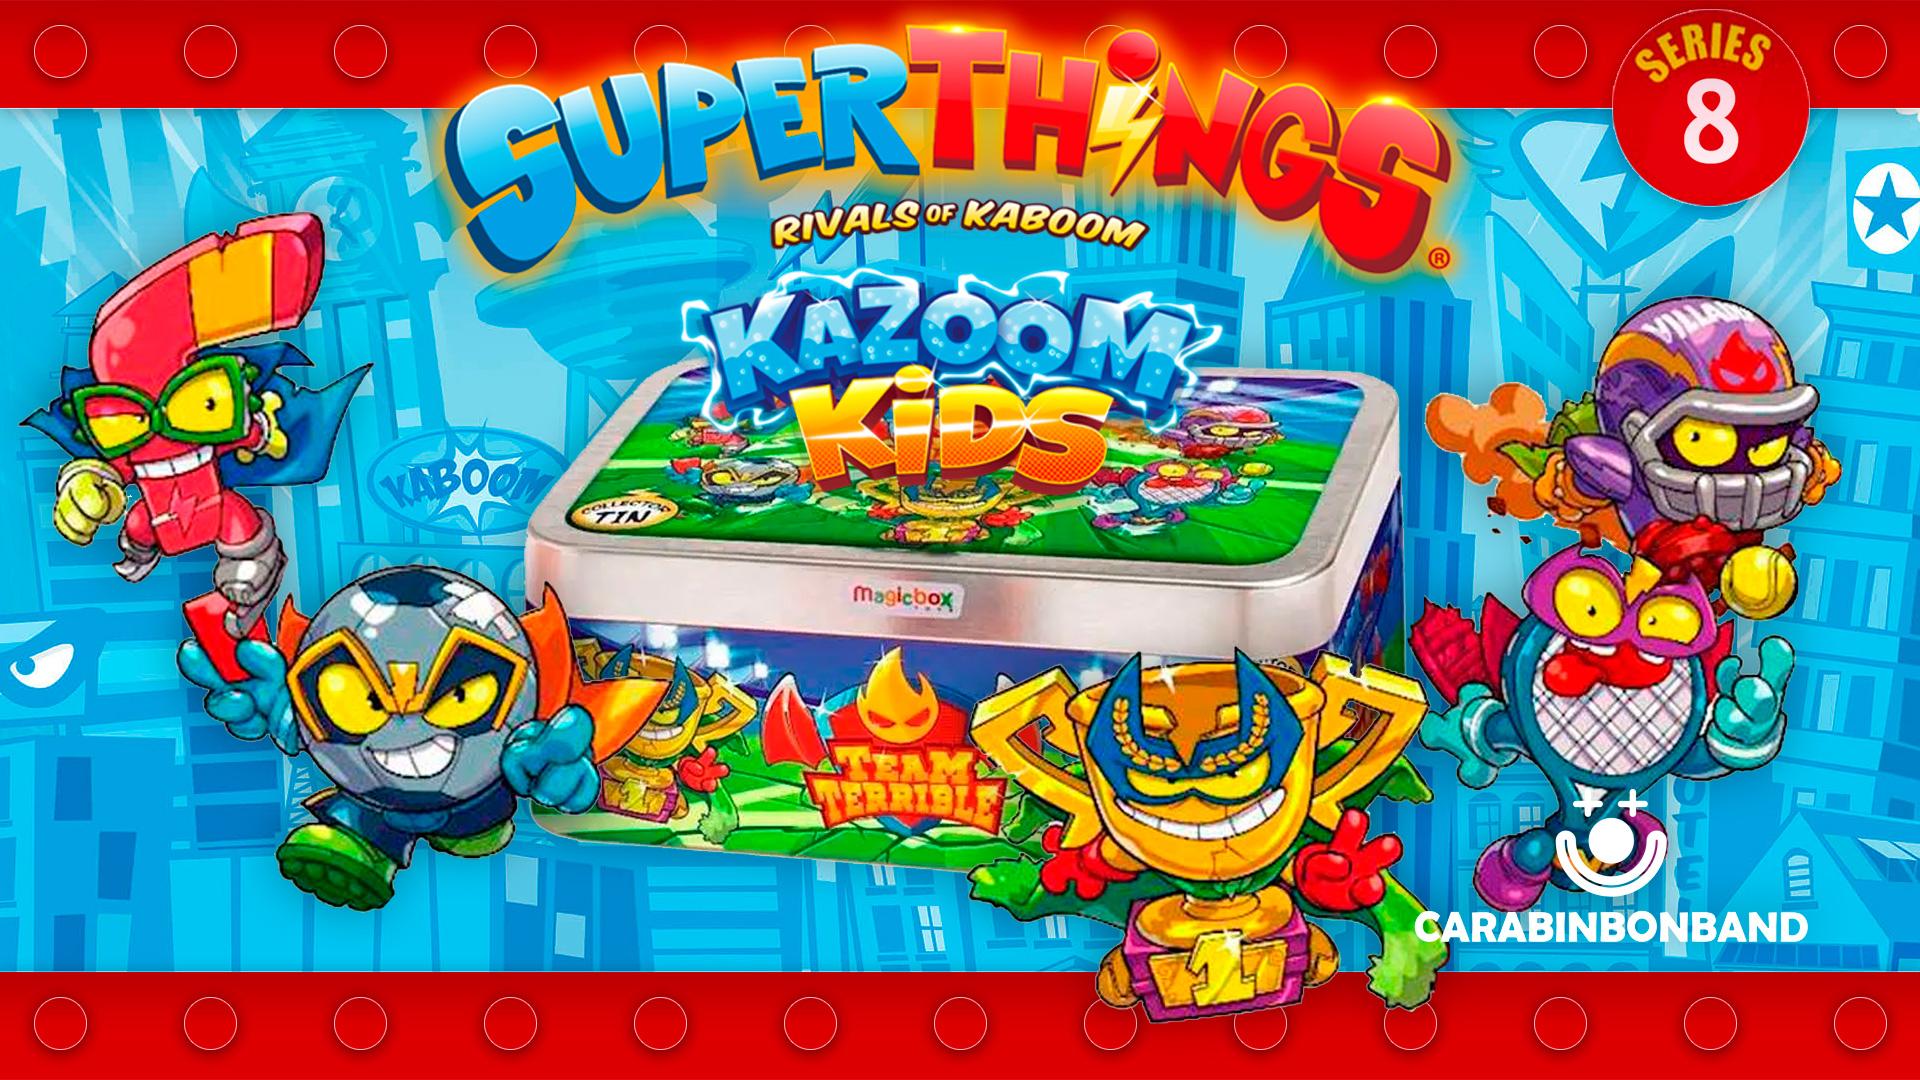 UNBOXING SUPERTHINGS 8 - TEAM TERRIBLE TIN - SUPERZINGS KAZOOM KIDS